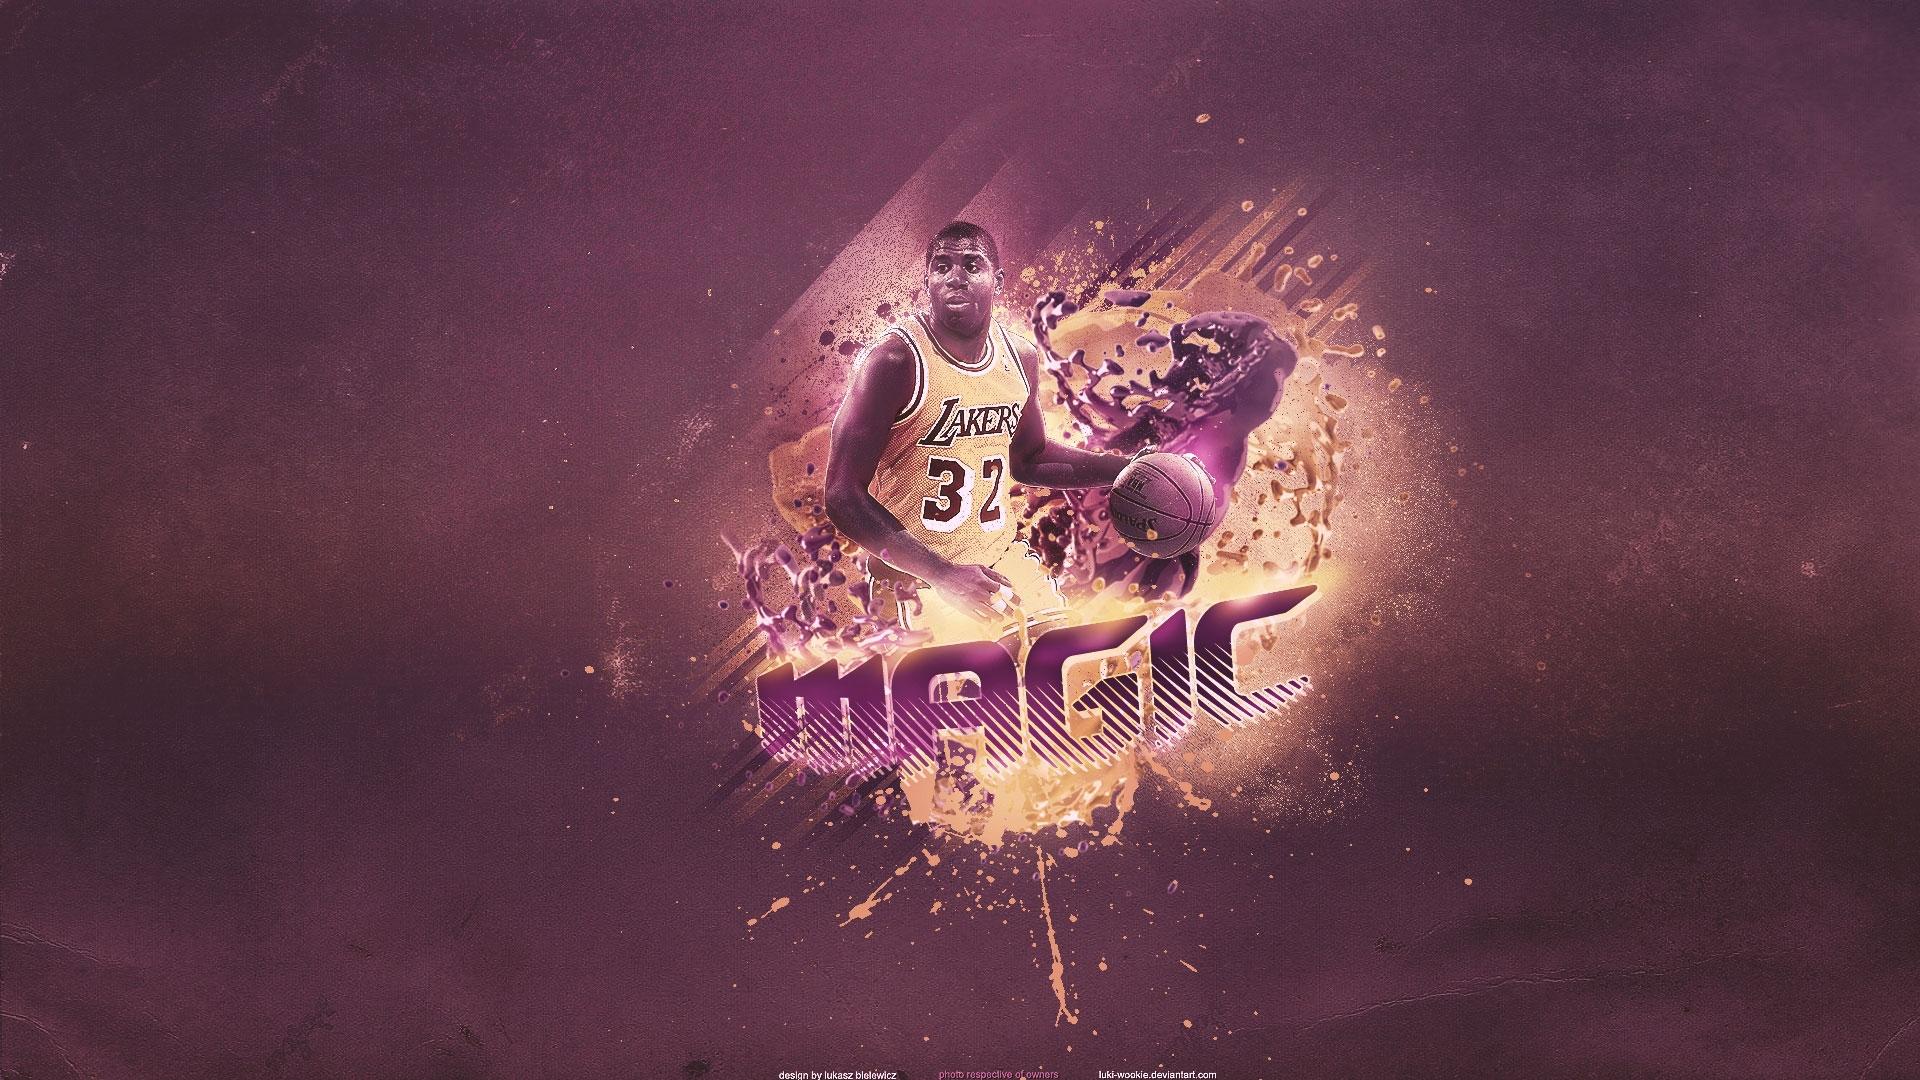 Download magic lakers nba wallpaper HD wallpaper 1920x1080